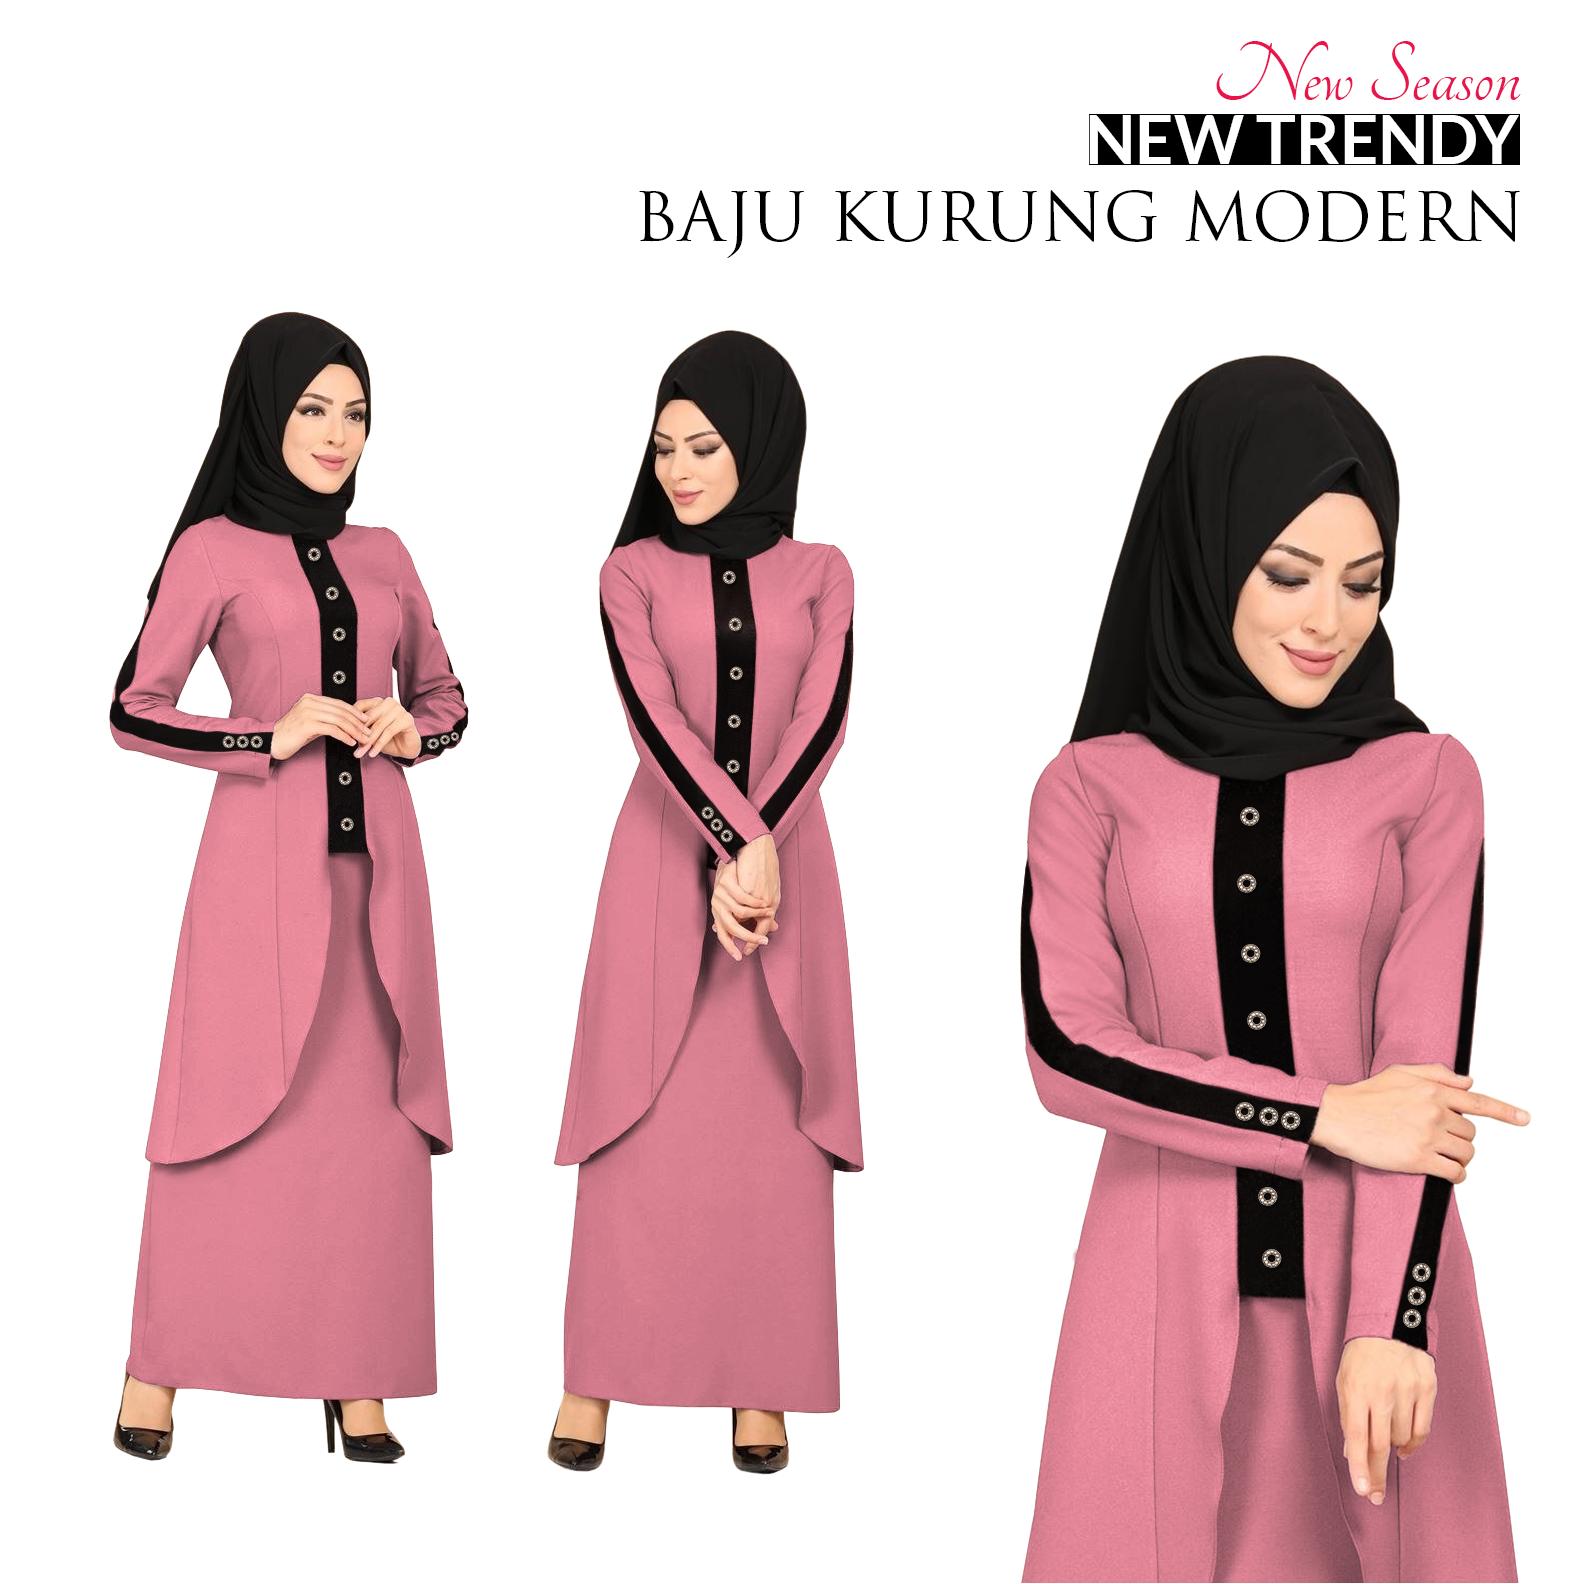 Price List New Season Trendy Baju Kurung Modern for Muslimah Terbaik